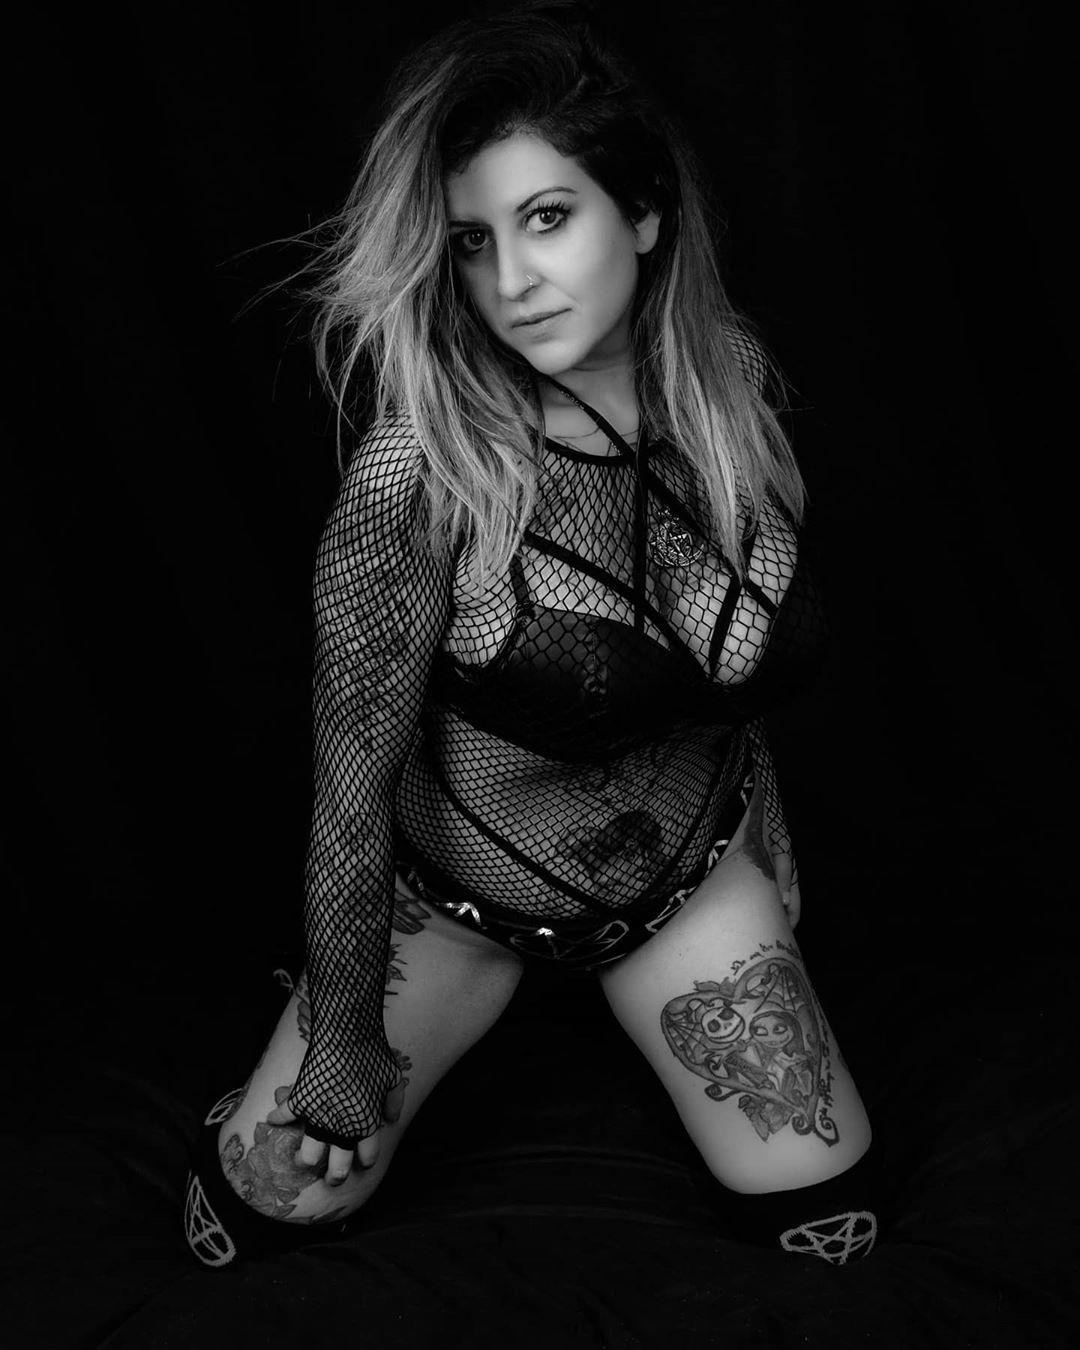 Boss Lady Vaper Instagram – 2020-05-06 19:46:46 95657930 165562511646735 4228795348838735327 n